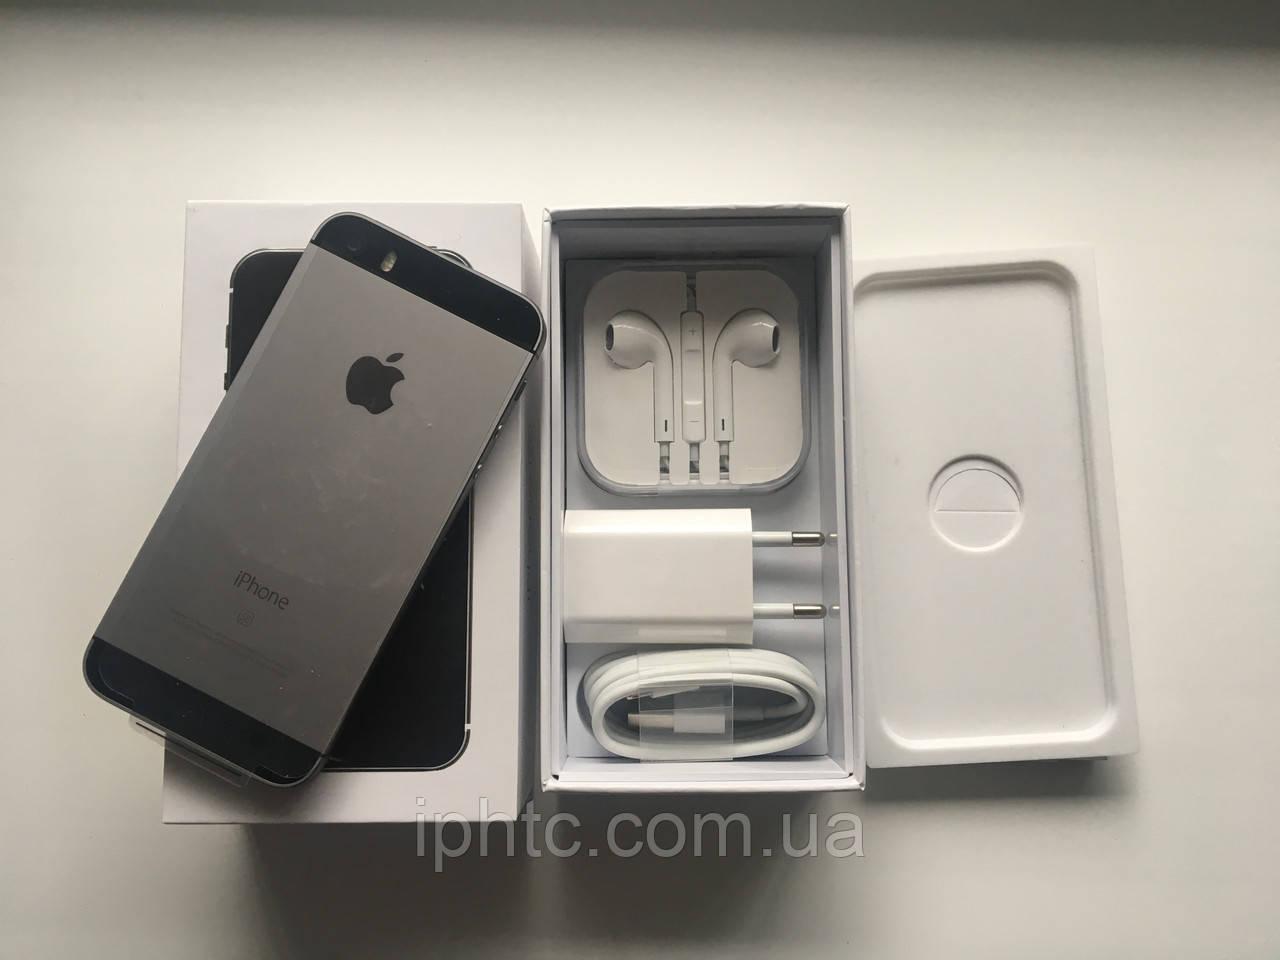 Apple iPhone SE 32GB Grey 4G /Новый / NeverLock